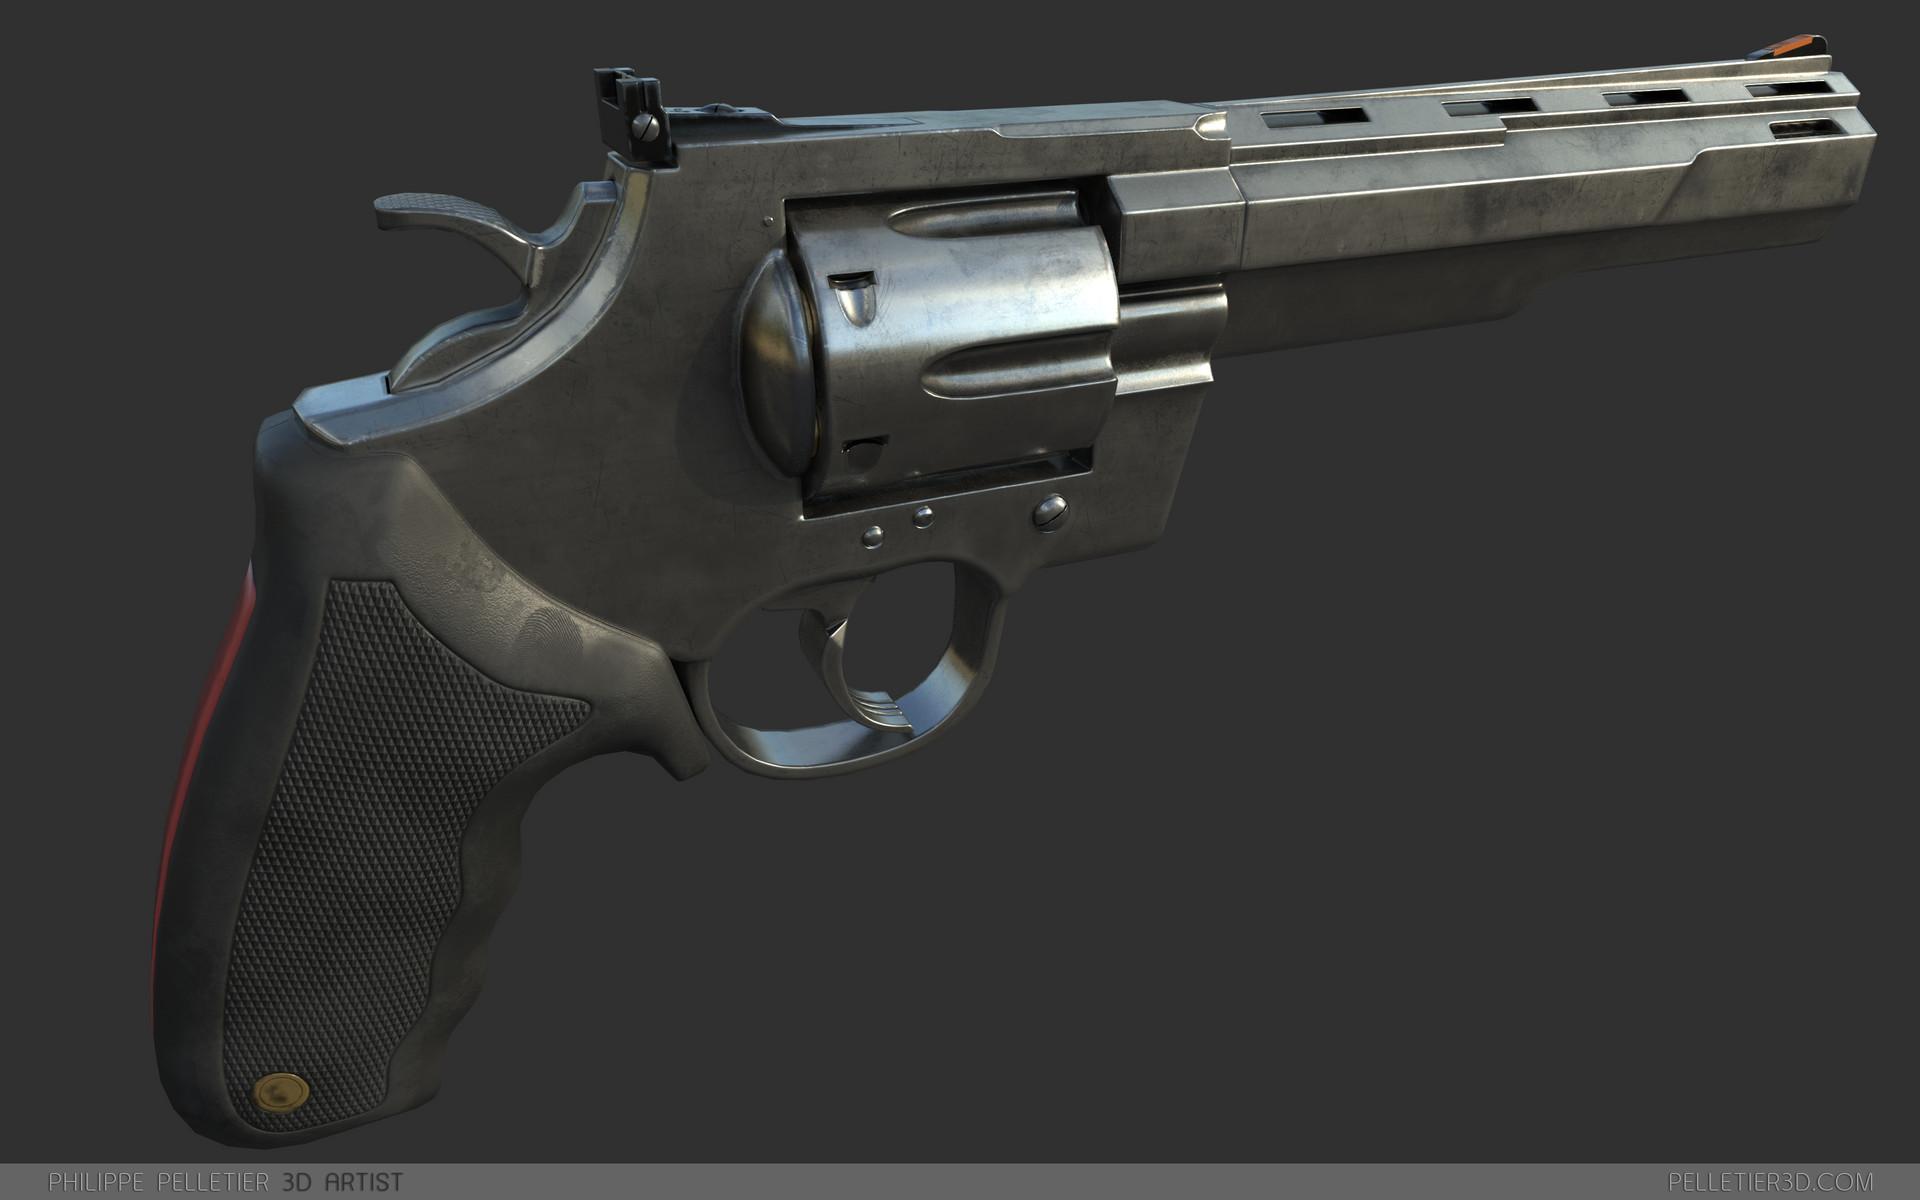 Philippe pelletier revolver 006